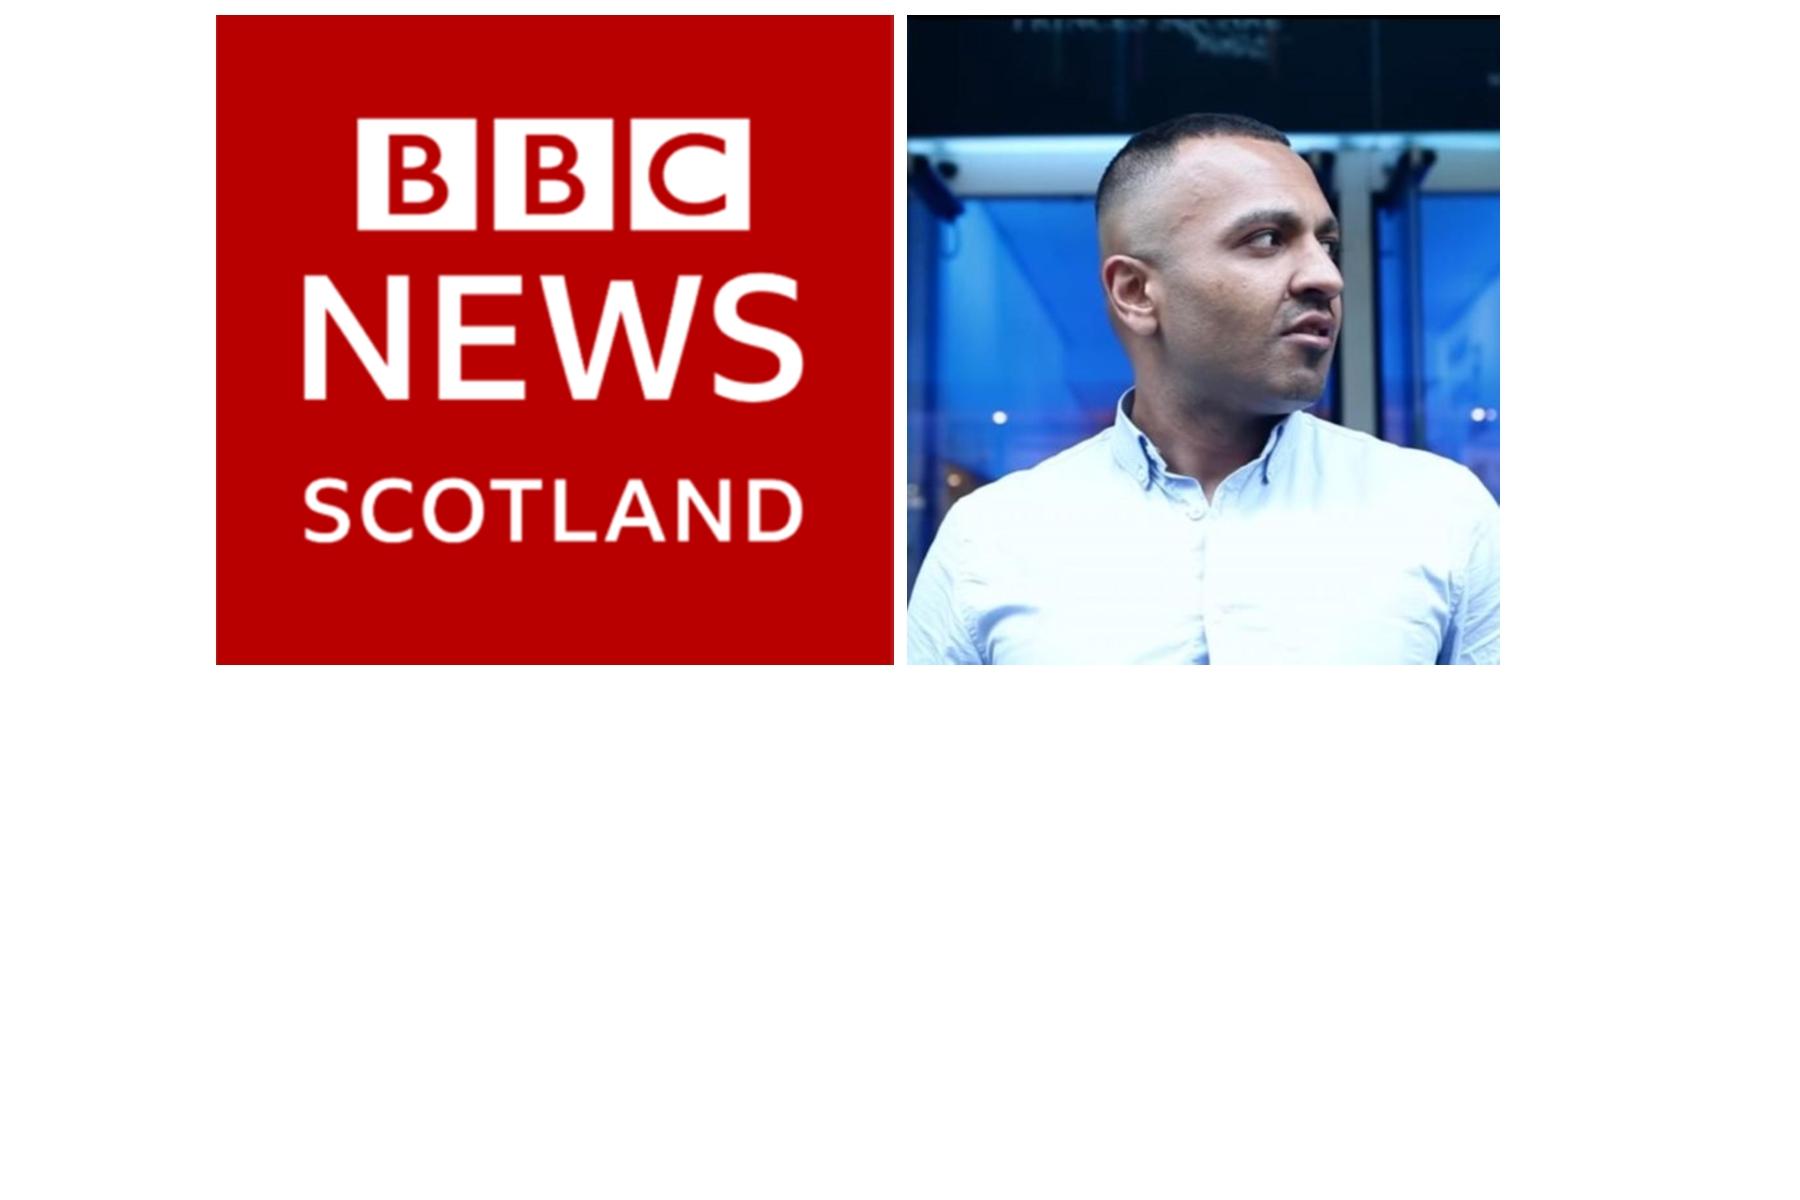 BBC News Use Negative Bias Against Adnan Ahmed (Not Guilty!) – Woman Alleged Kim Kardashian Lookalike Line Was A TV Stunt